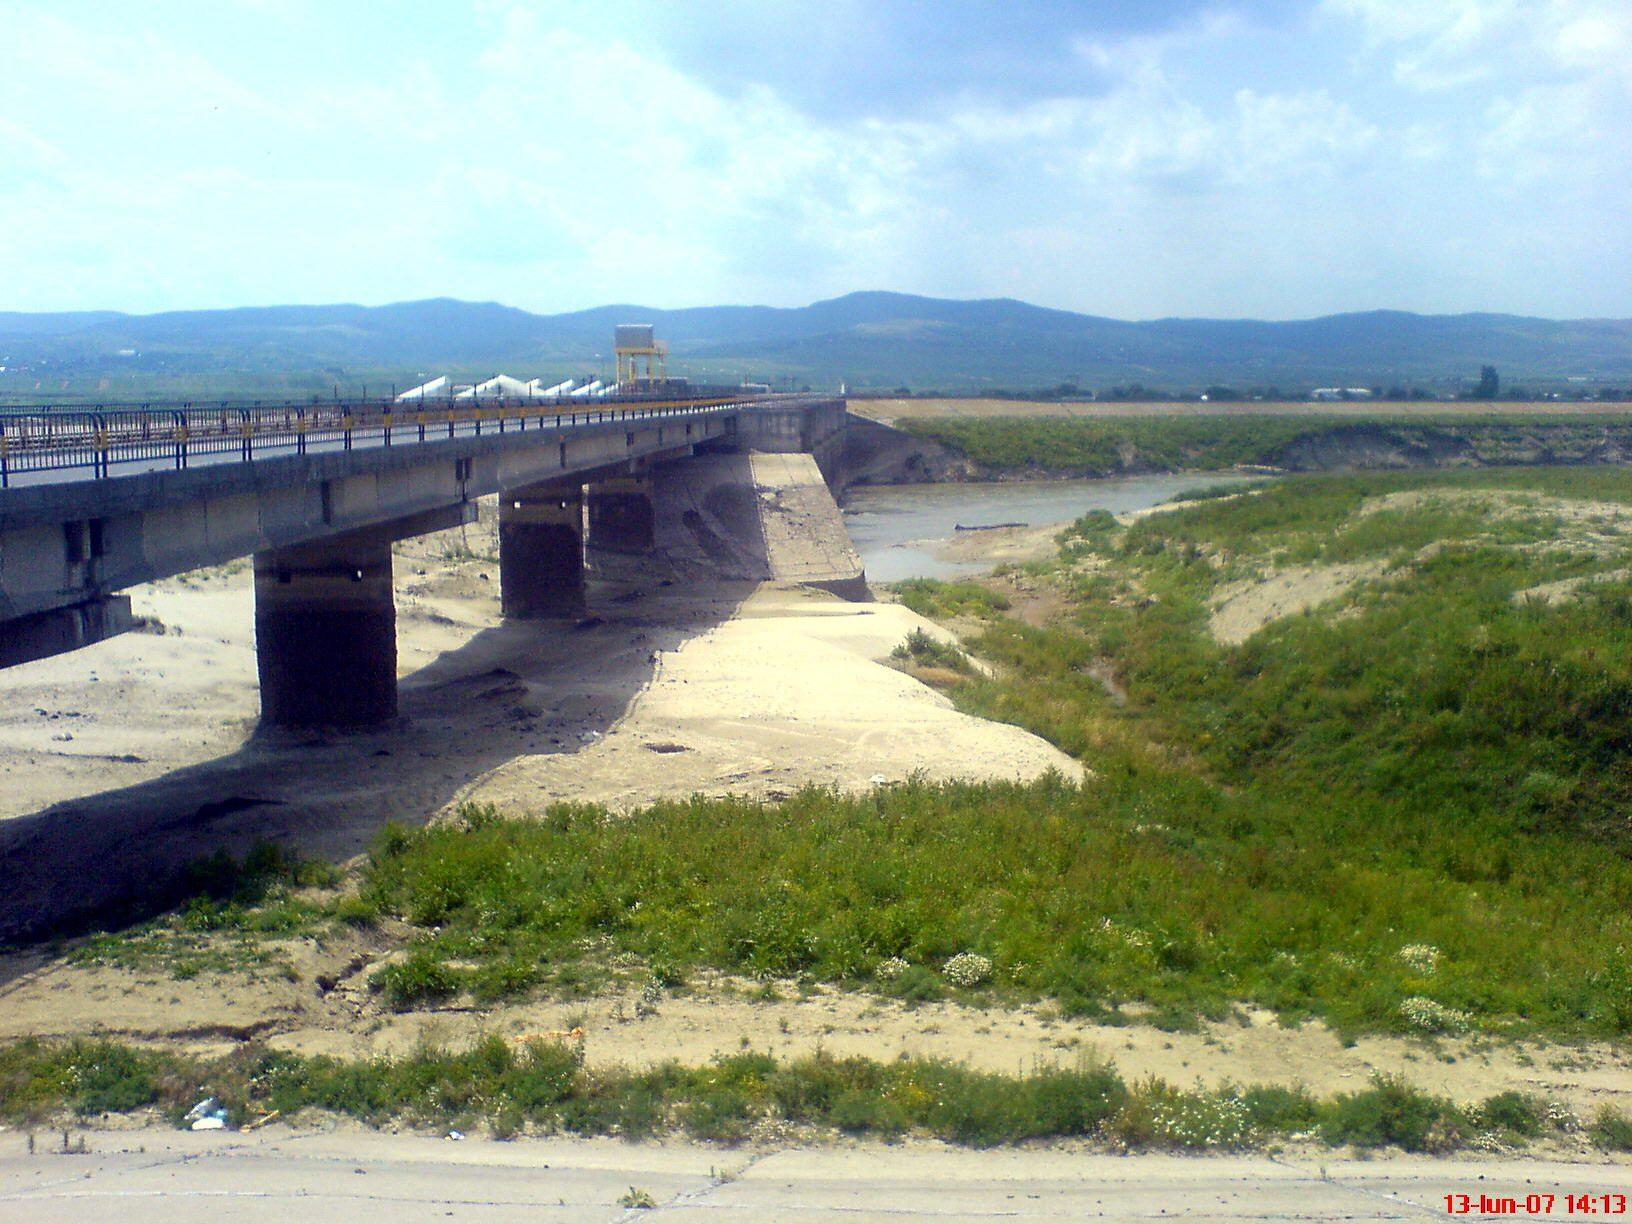 Dry lake and dam